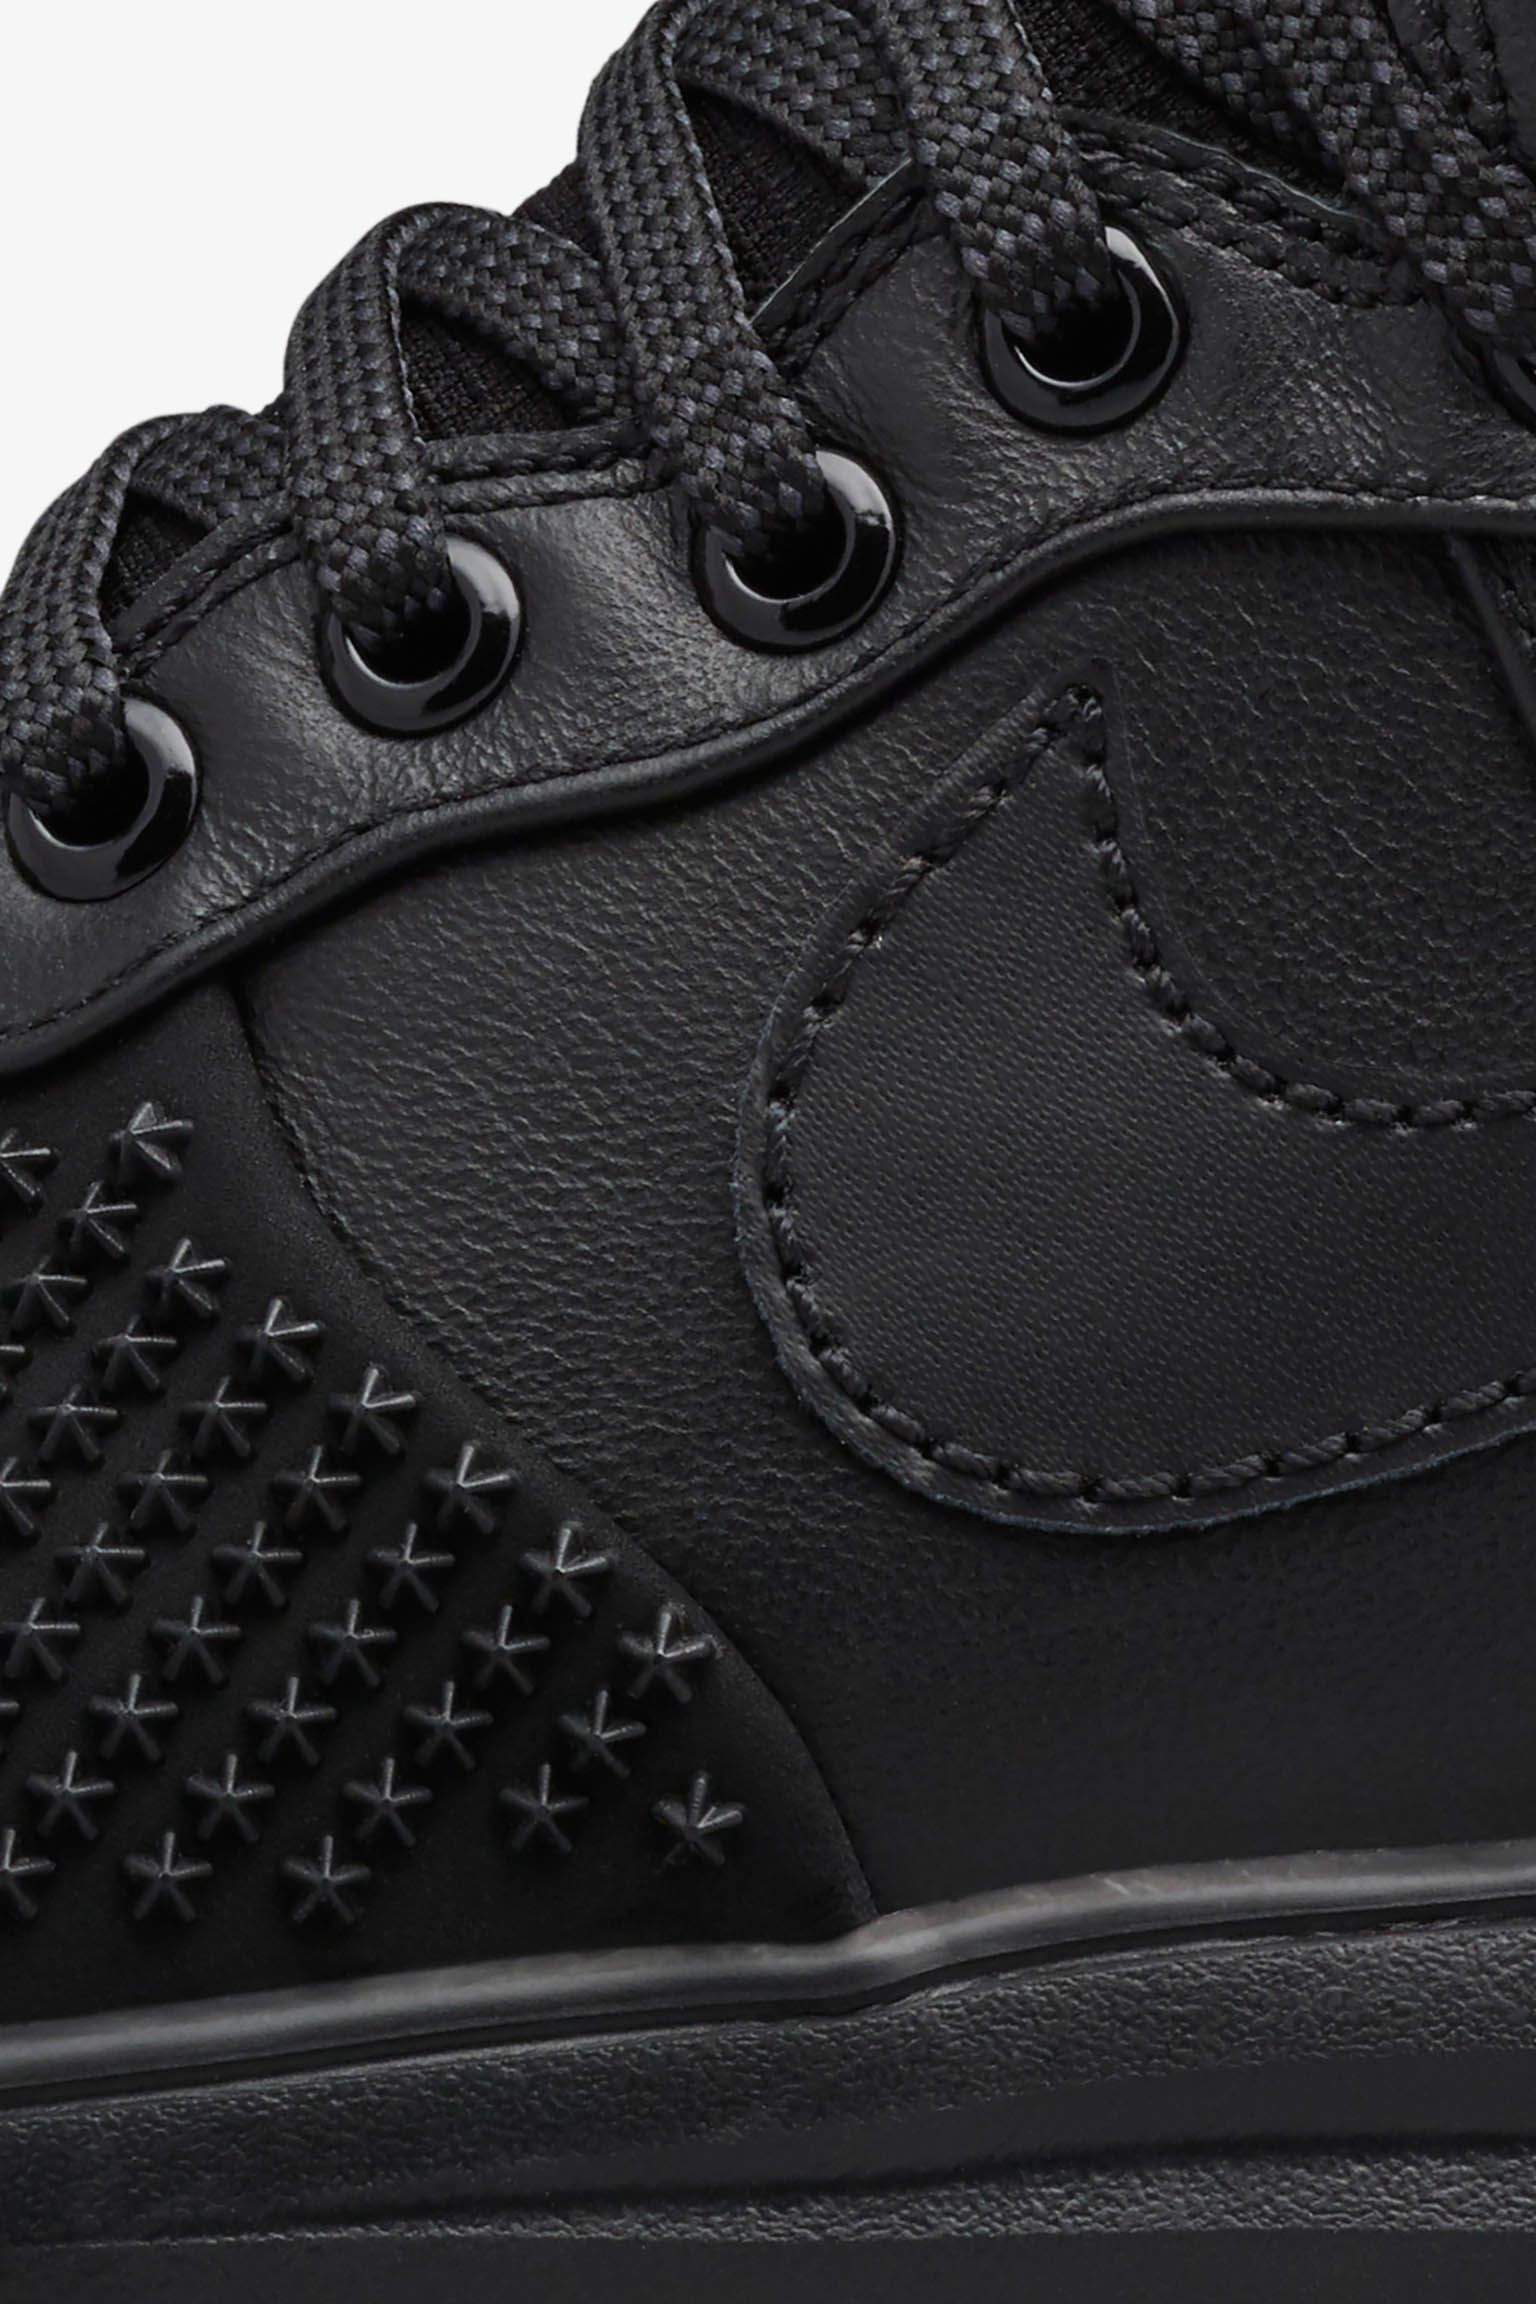 Nike Lunar Force 1 Duckboot 'Black & Gum'